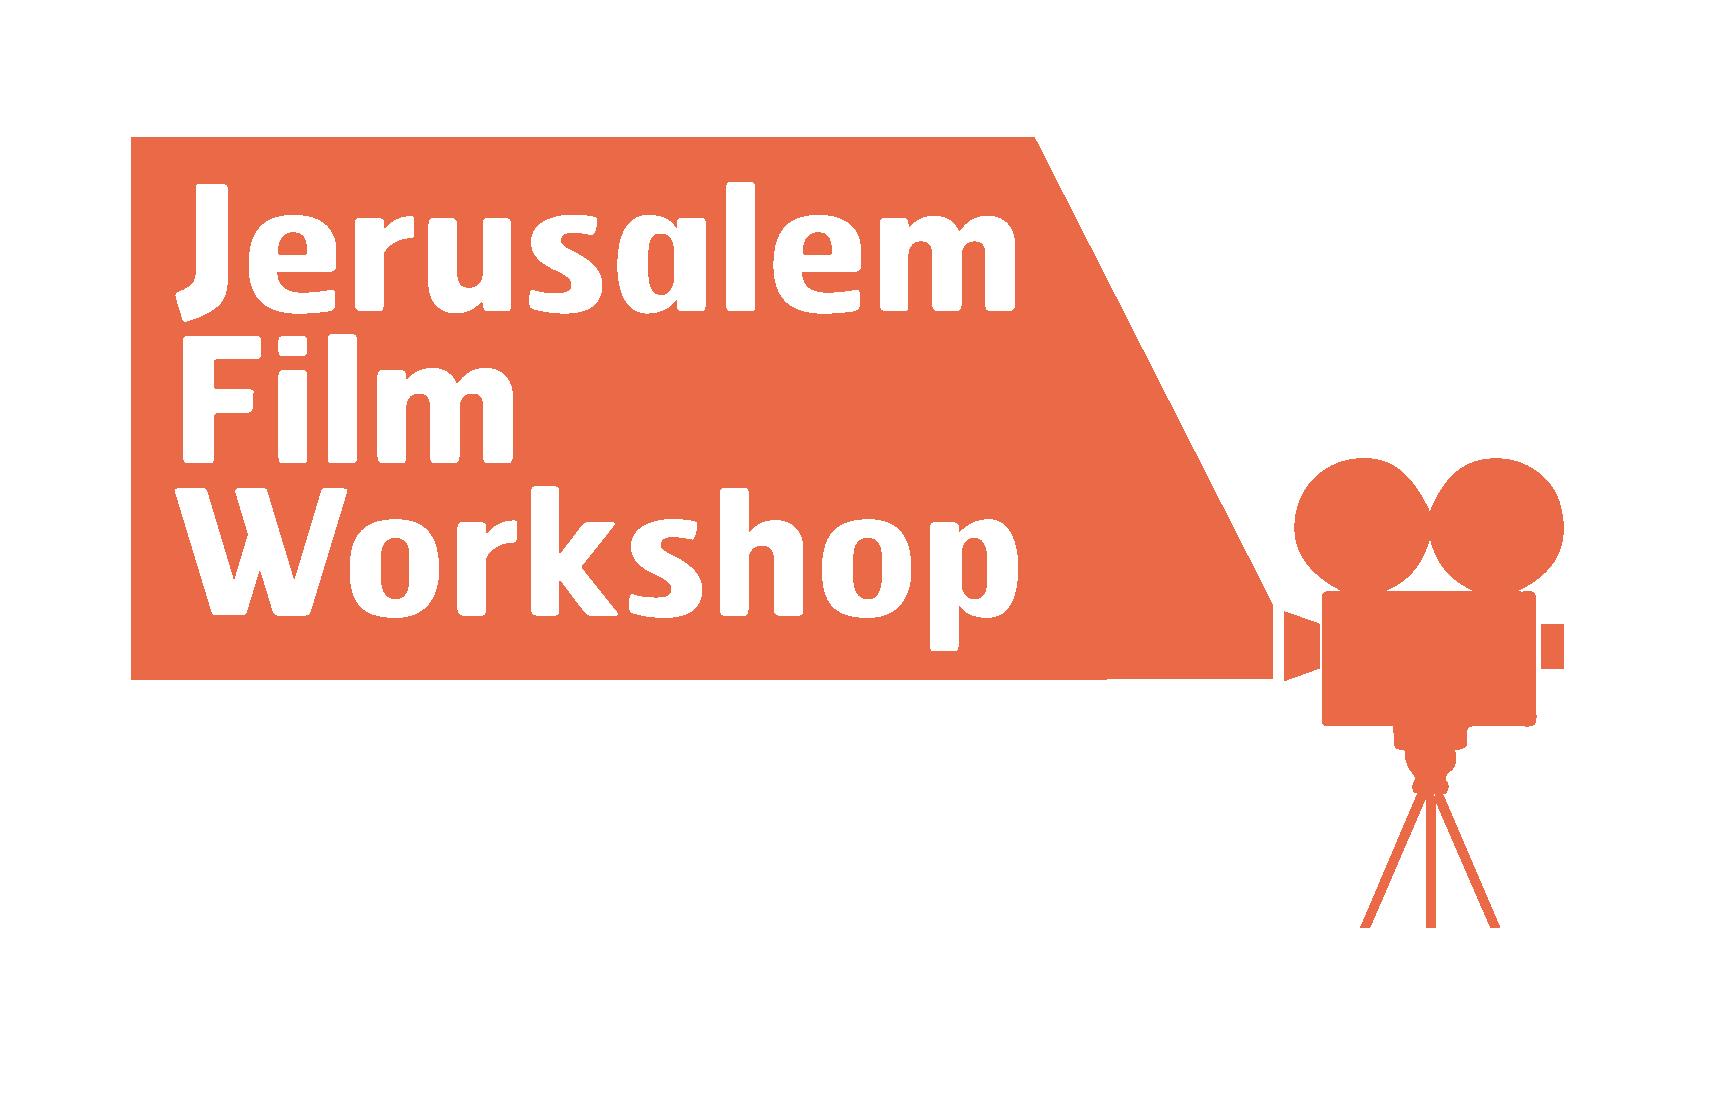 jerusalem film workshop גרוזלם פילם וורקשופ